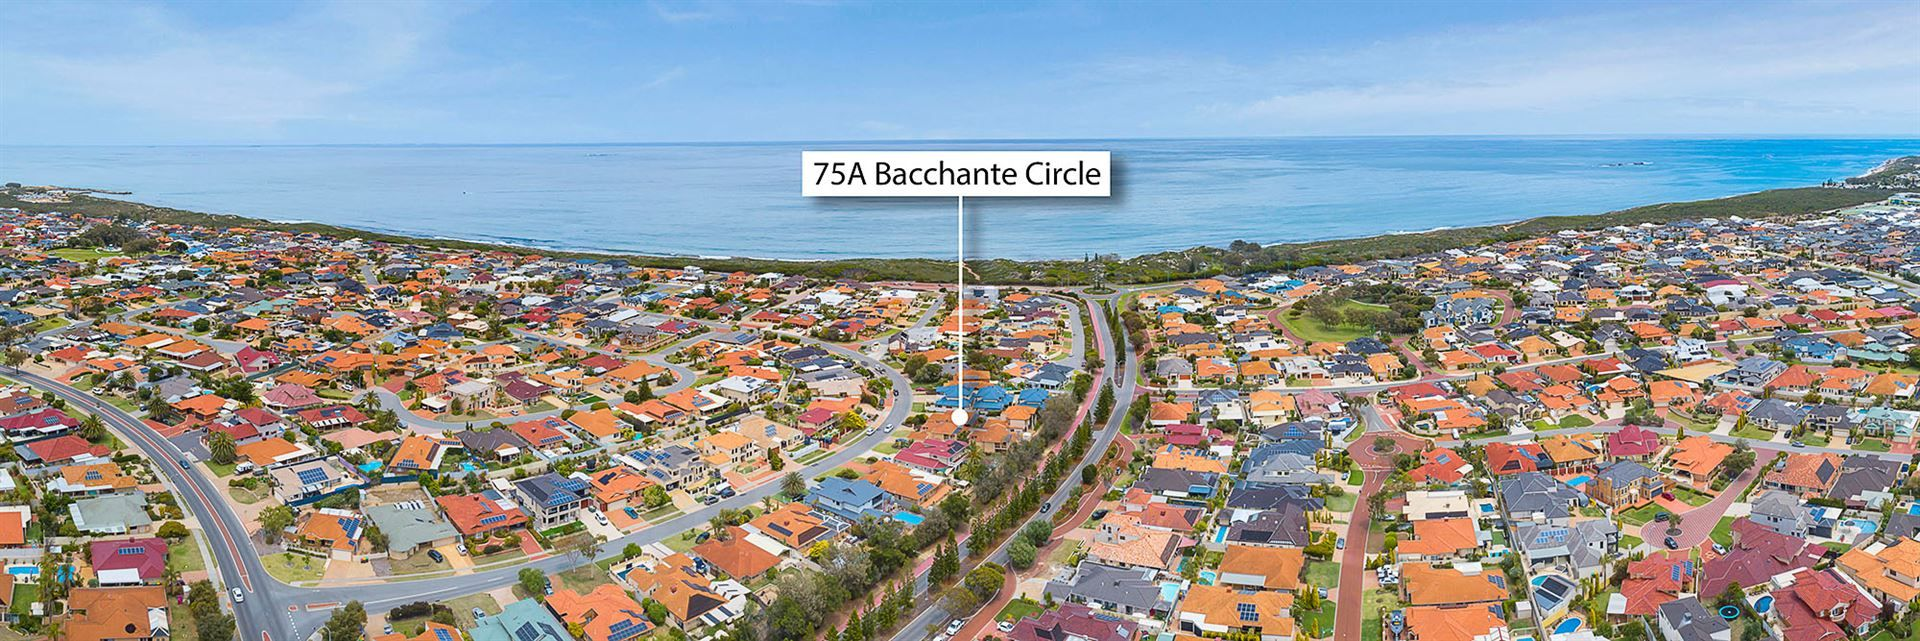 75a Bacchante Circle, Ocean Reef WA 6027, Image 2